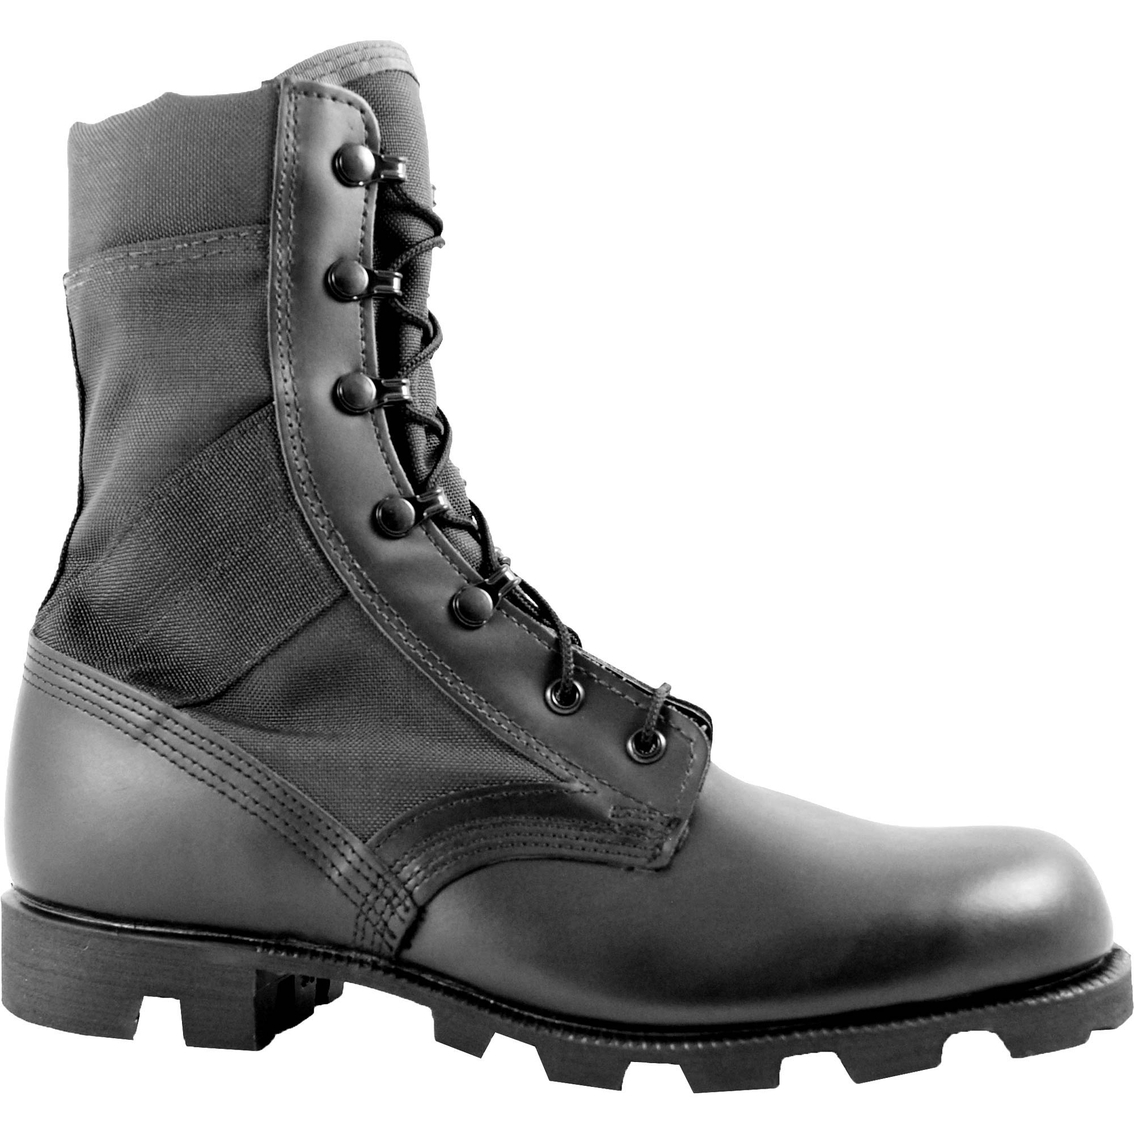 Mcrae Black Hot Weather Jungle Combat Boots With Panama Outsole ... cc5dcc5cc70b